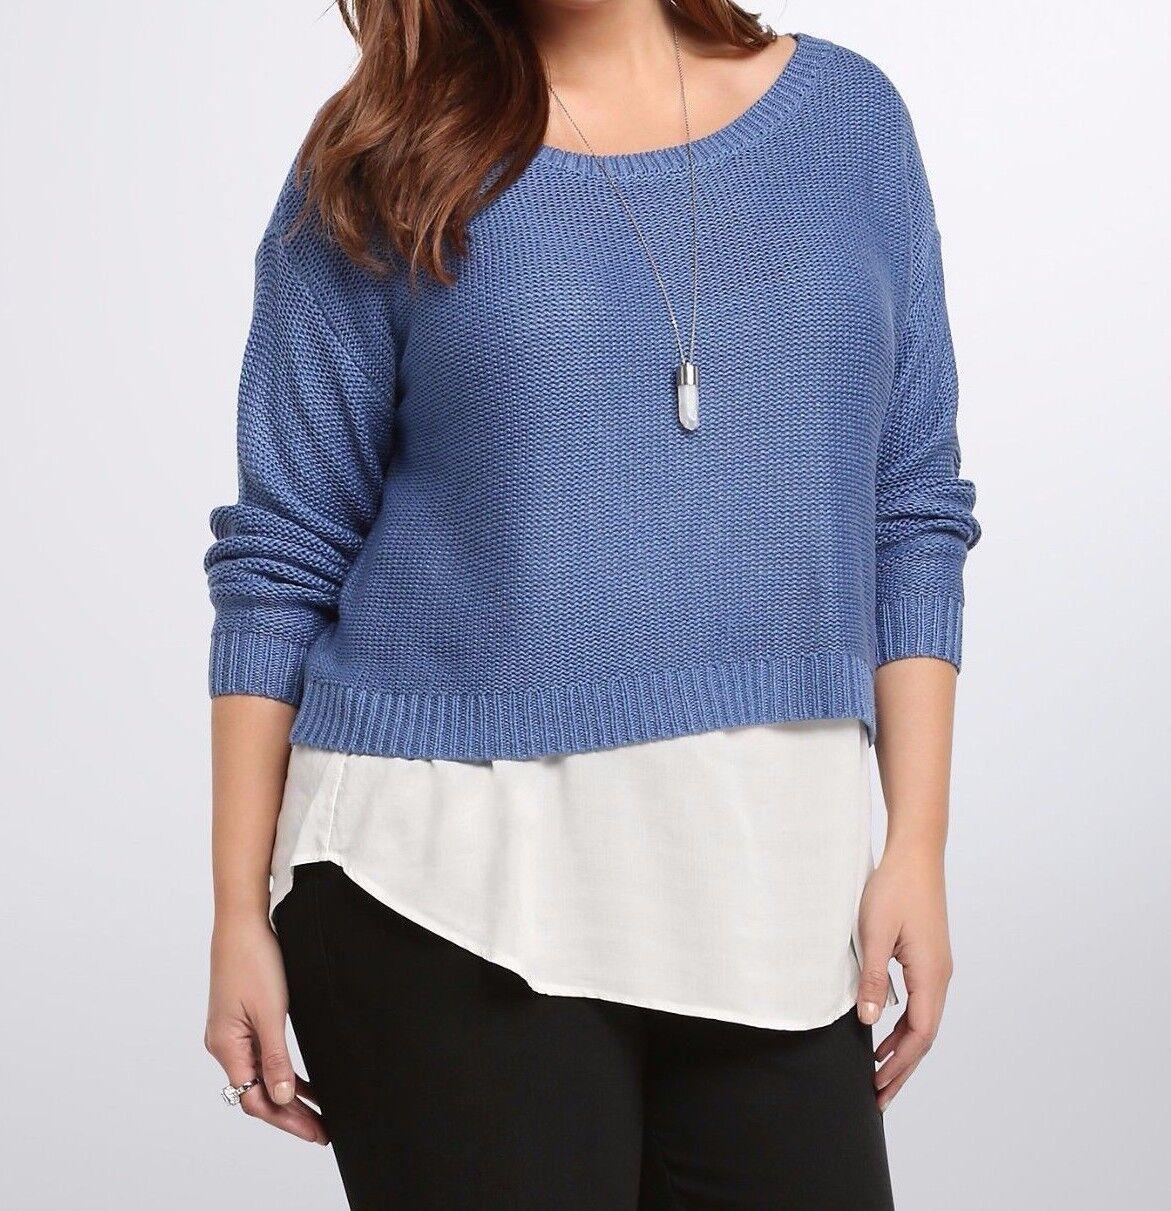 Torrid Light bluee & White Tank Knit Layered Sweater  Sz  0 0X 13191